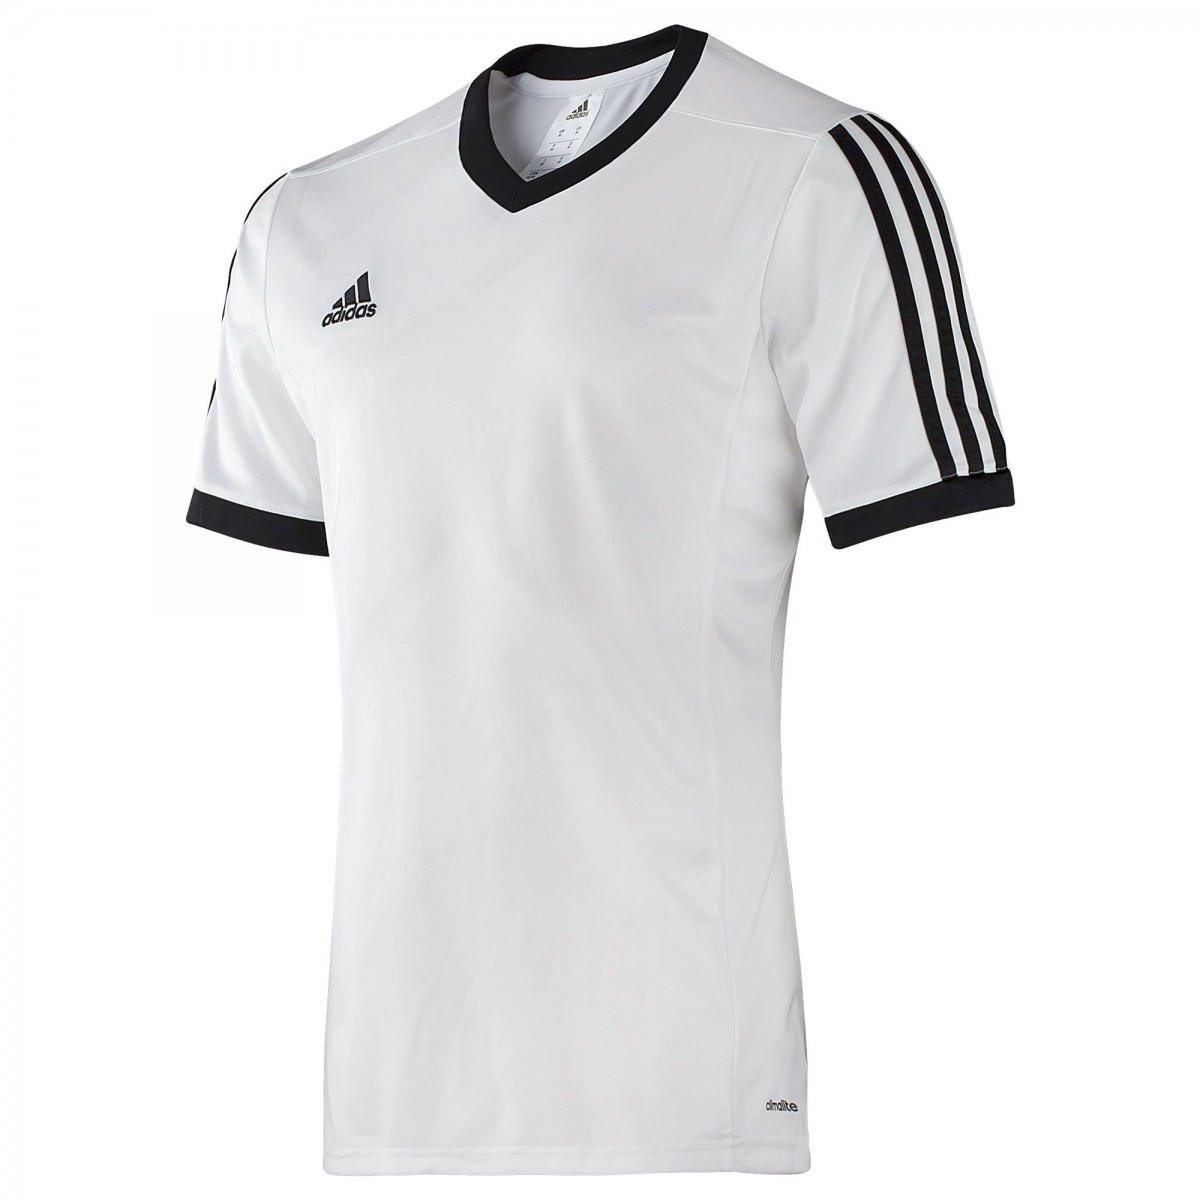 cb81dac4fd Bizz Store - Camisa Masculina Adidas Tabela 14 Futebol Branca